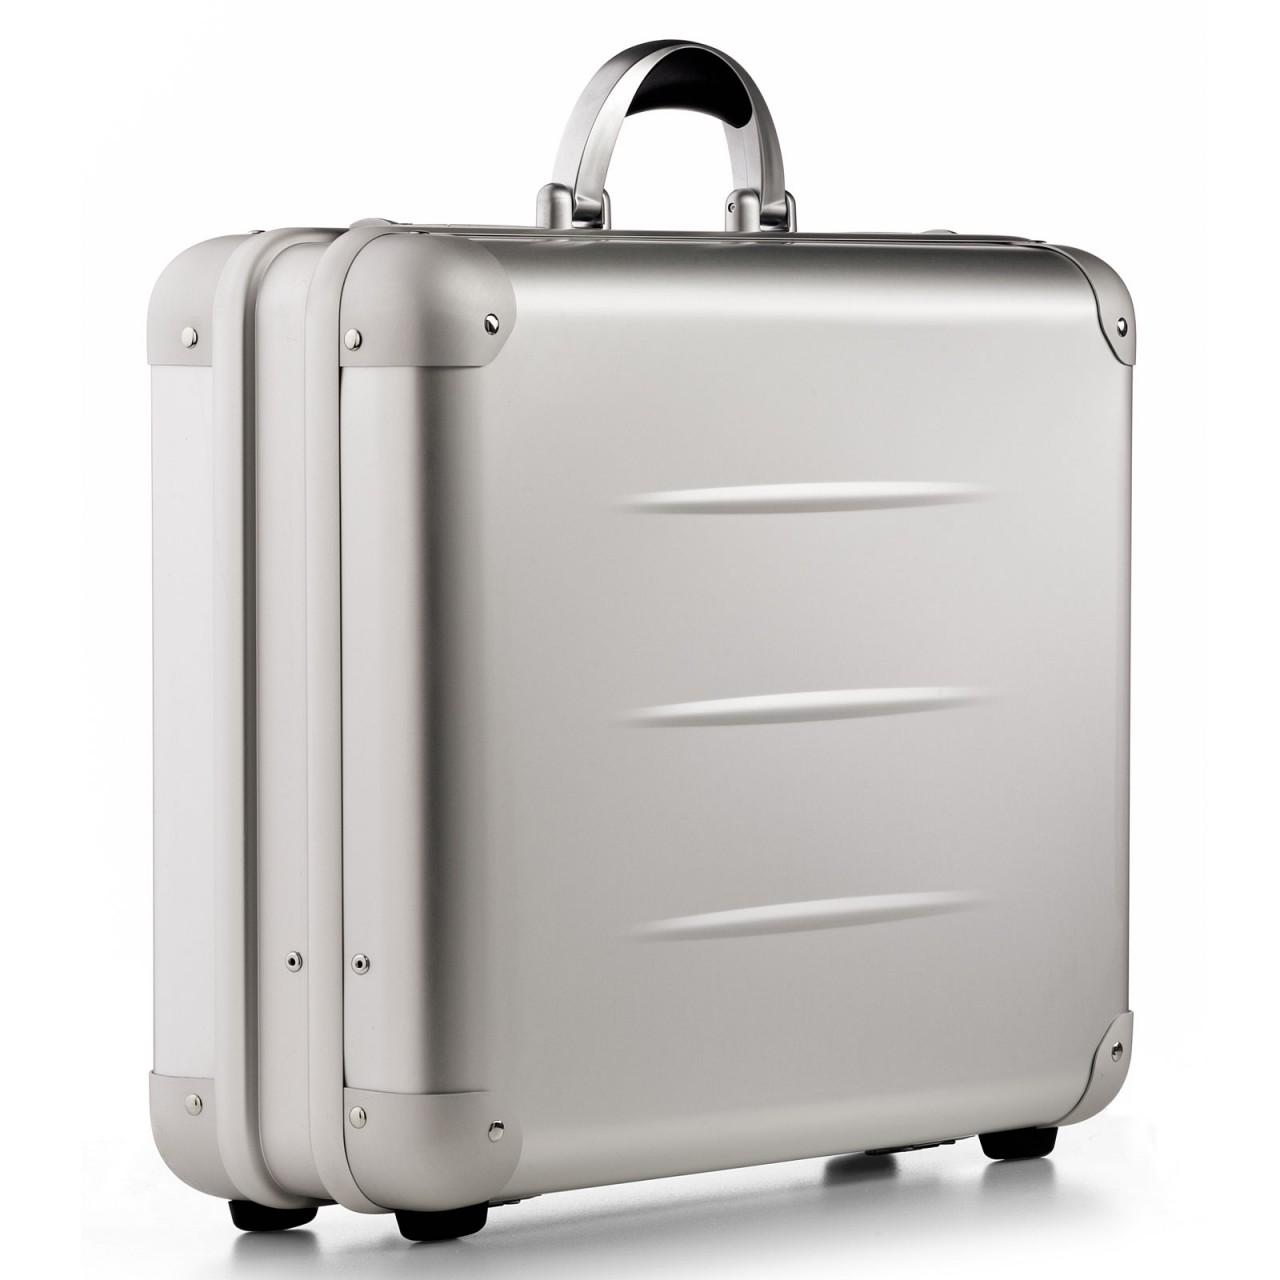 bwh koffer alupur typ 3 g nstig kaufen koffermarkt. Black Bedroom Furniture Sets. Home Design Ideas